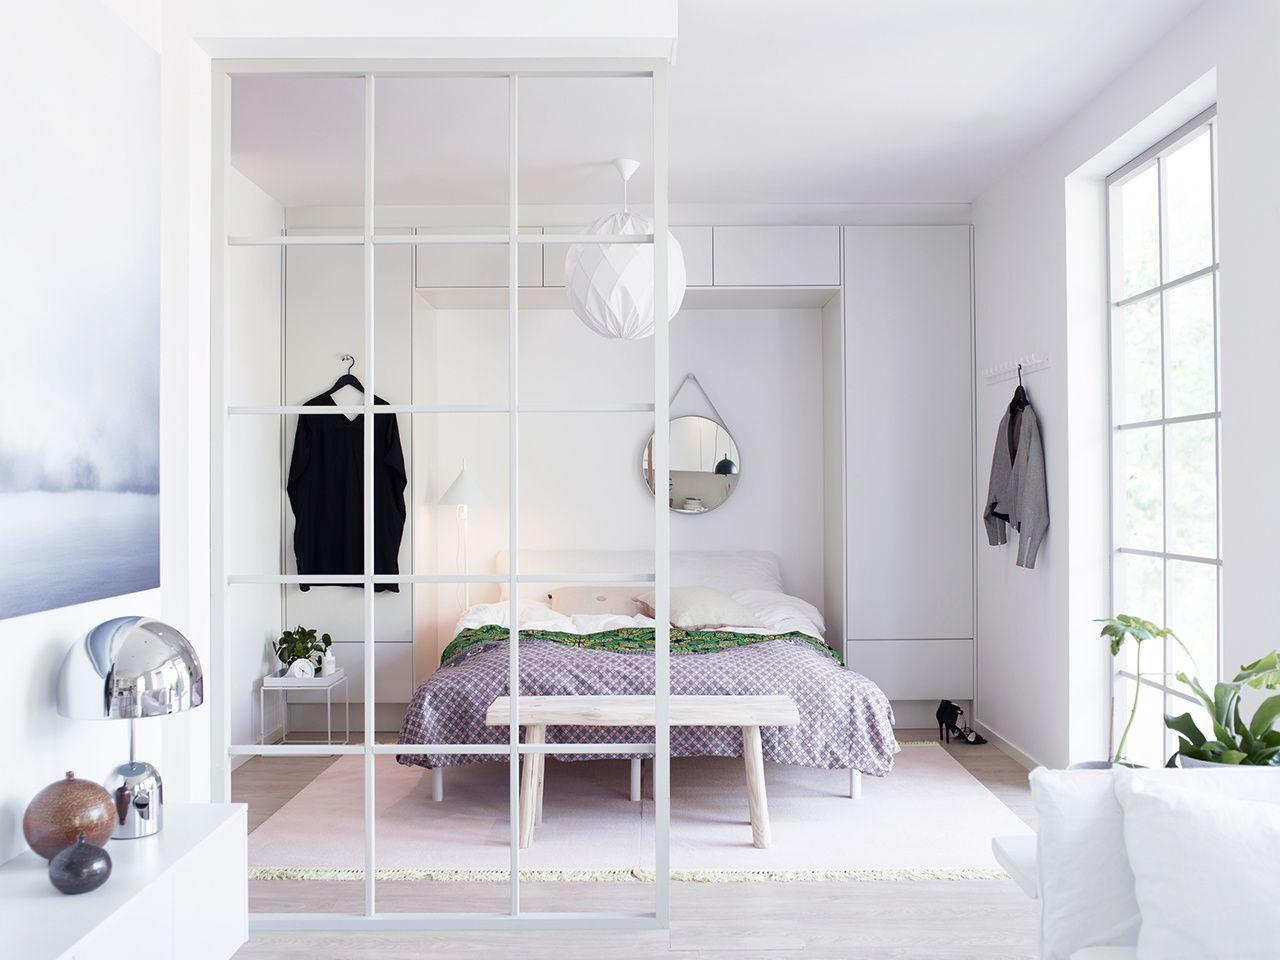 Inredning inspiration inredning sovrum : garderob,förvaring,sovrum,vedum,vitt sovrum | Inredning ...